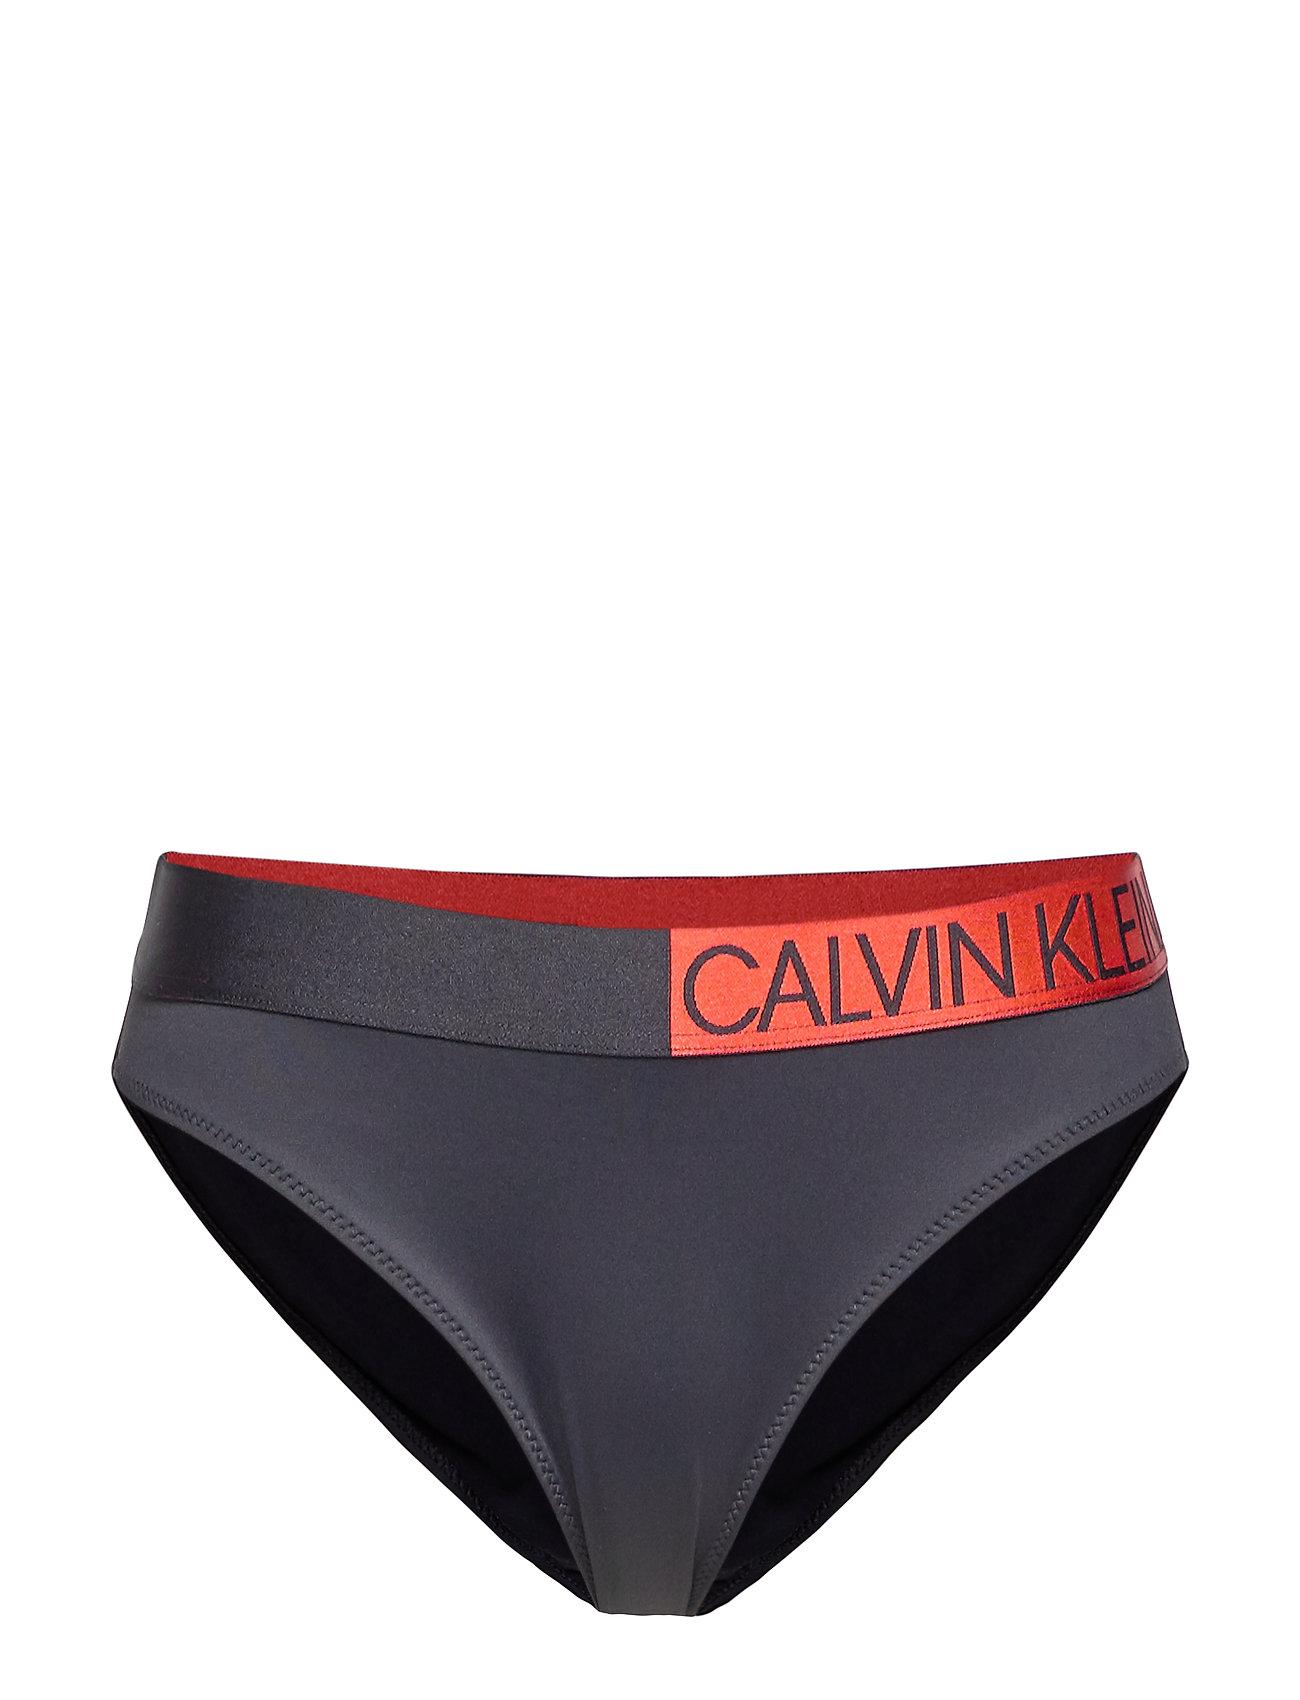 Calvin Klein CLASSIC BIKINI - PVH BLACK